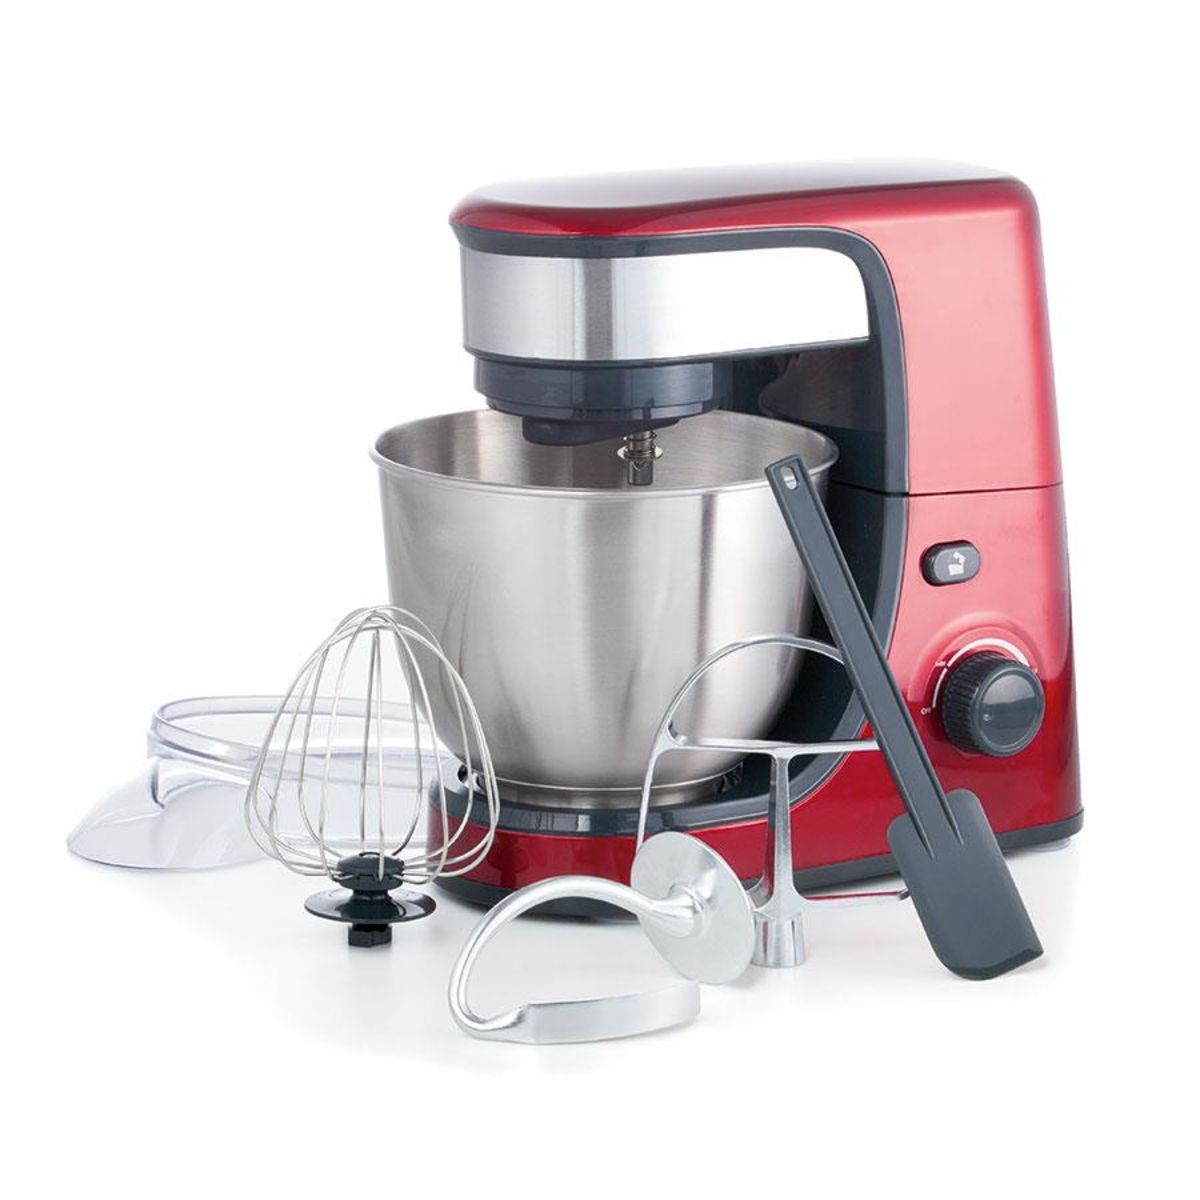 Hm Bench Mixer Red Homemaker Hm502-w